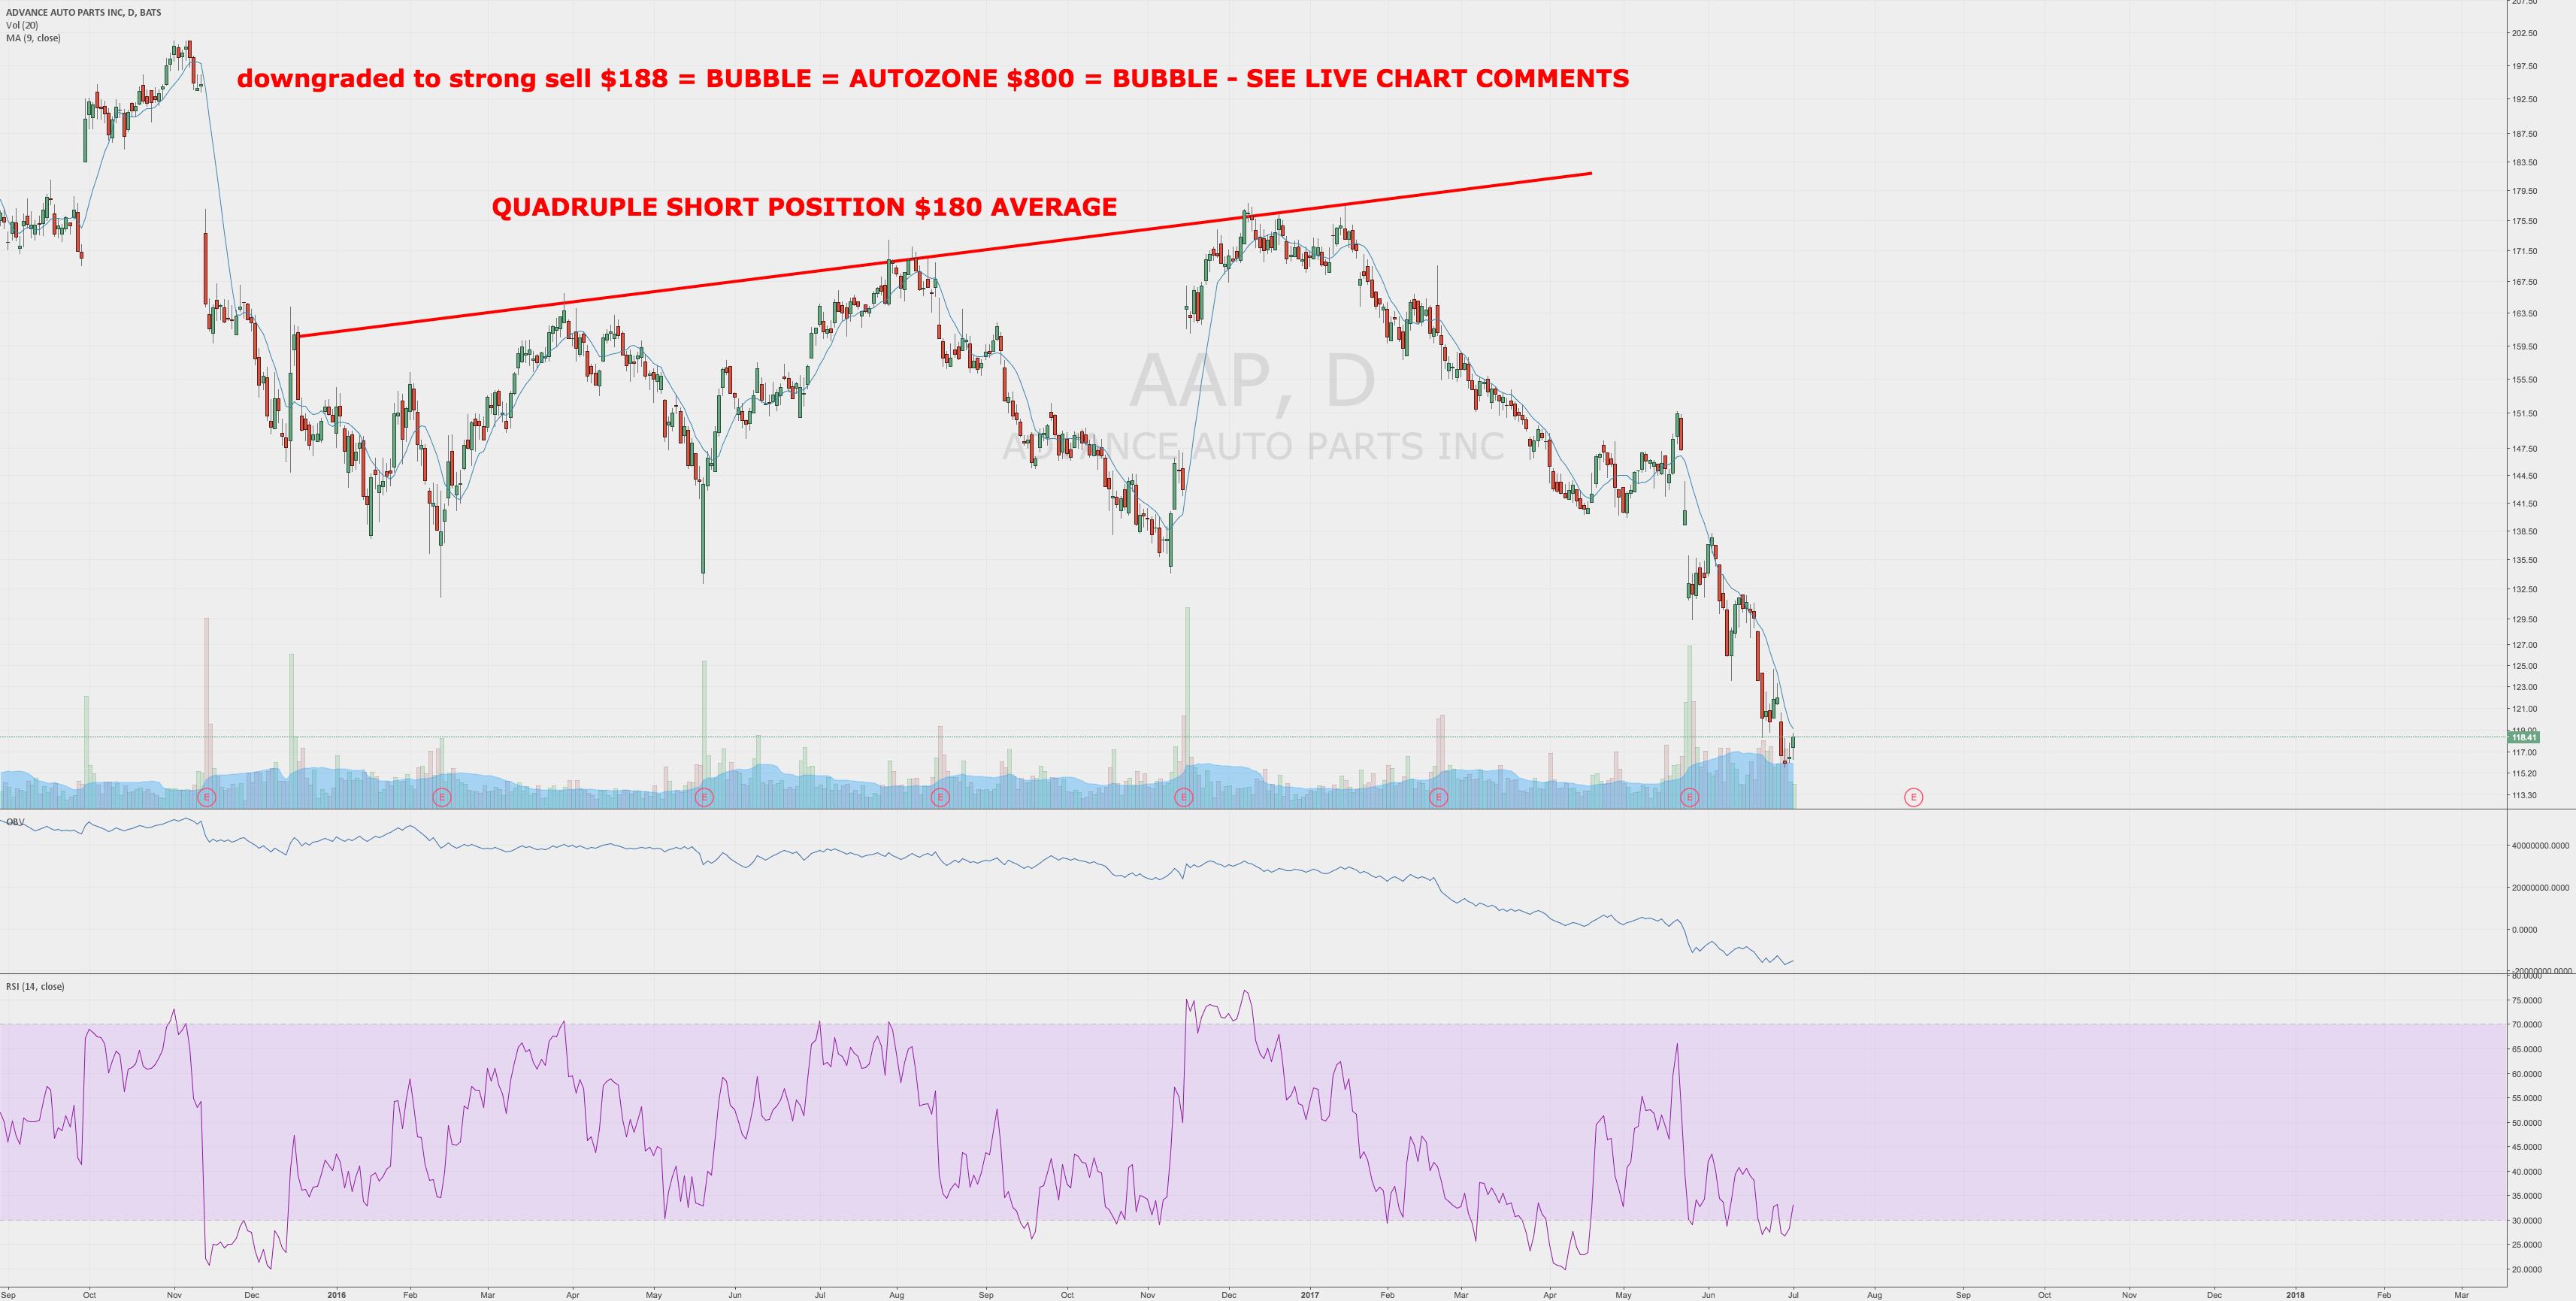 Autonomous Trading Reiterates STRONG SELL & CRASH $AAP $AZO